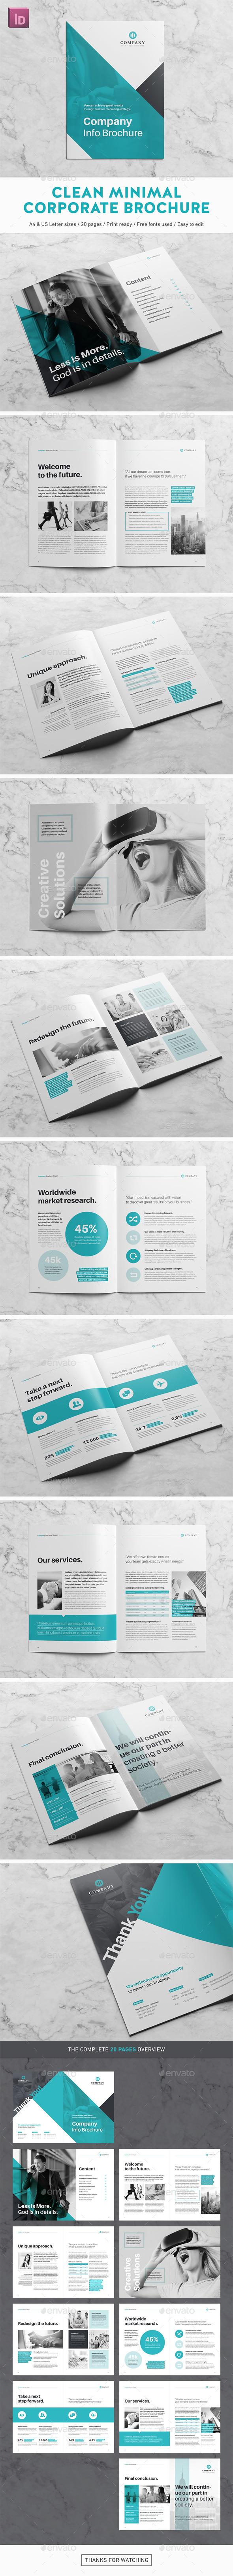 Clean Minimal Corporate Brochure - Corporate Brochures